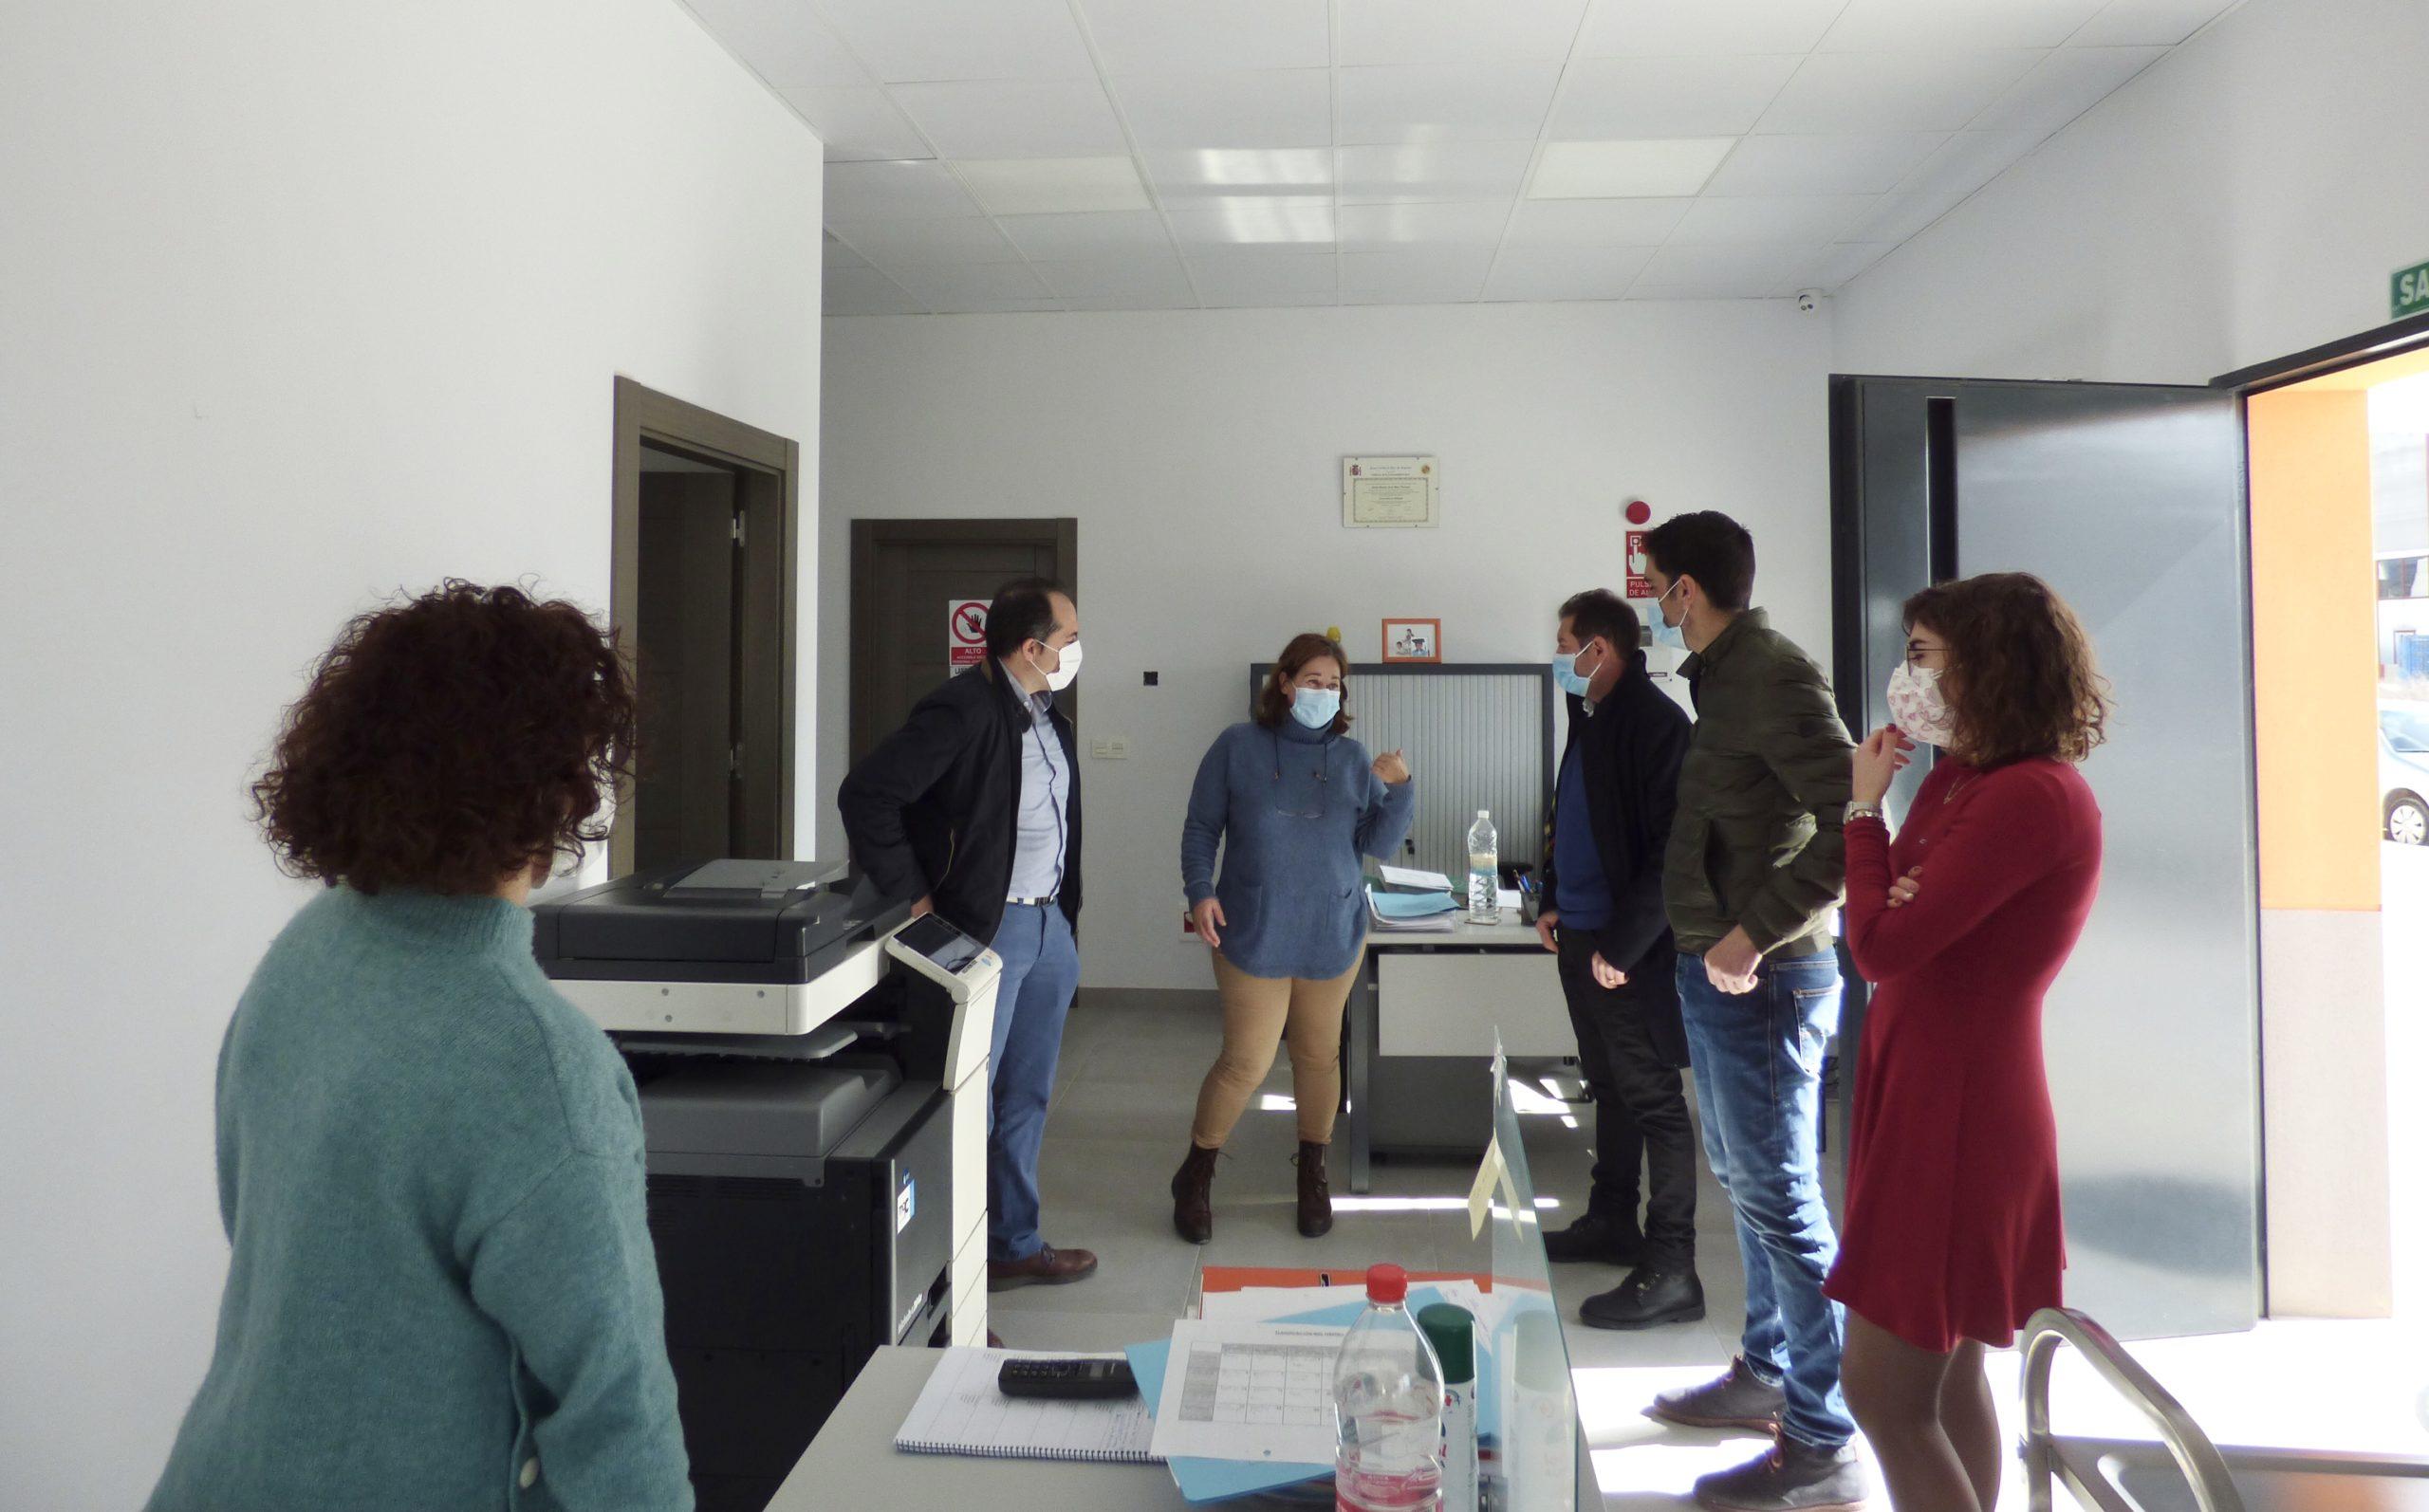 visita empresa Sanchez Marfil, gerente